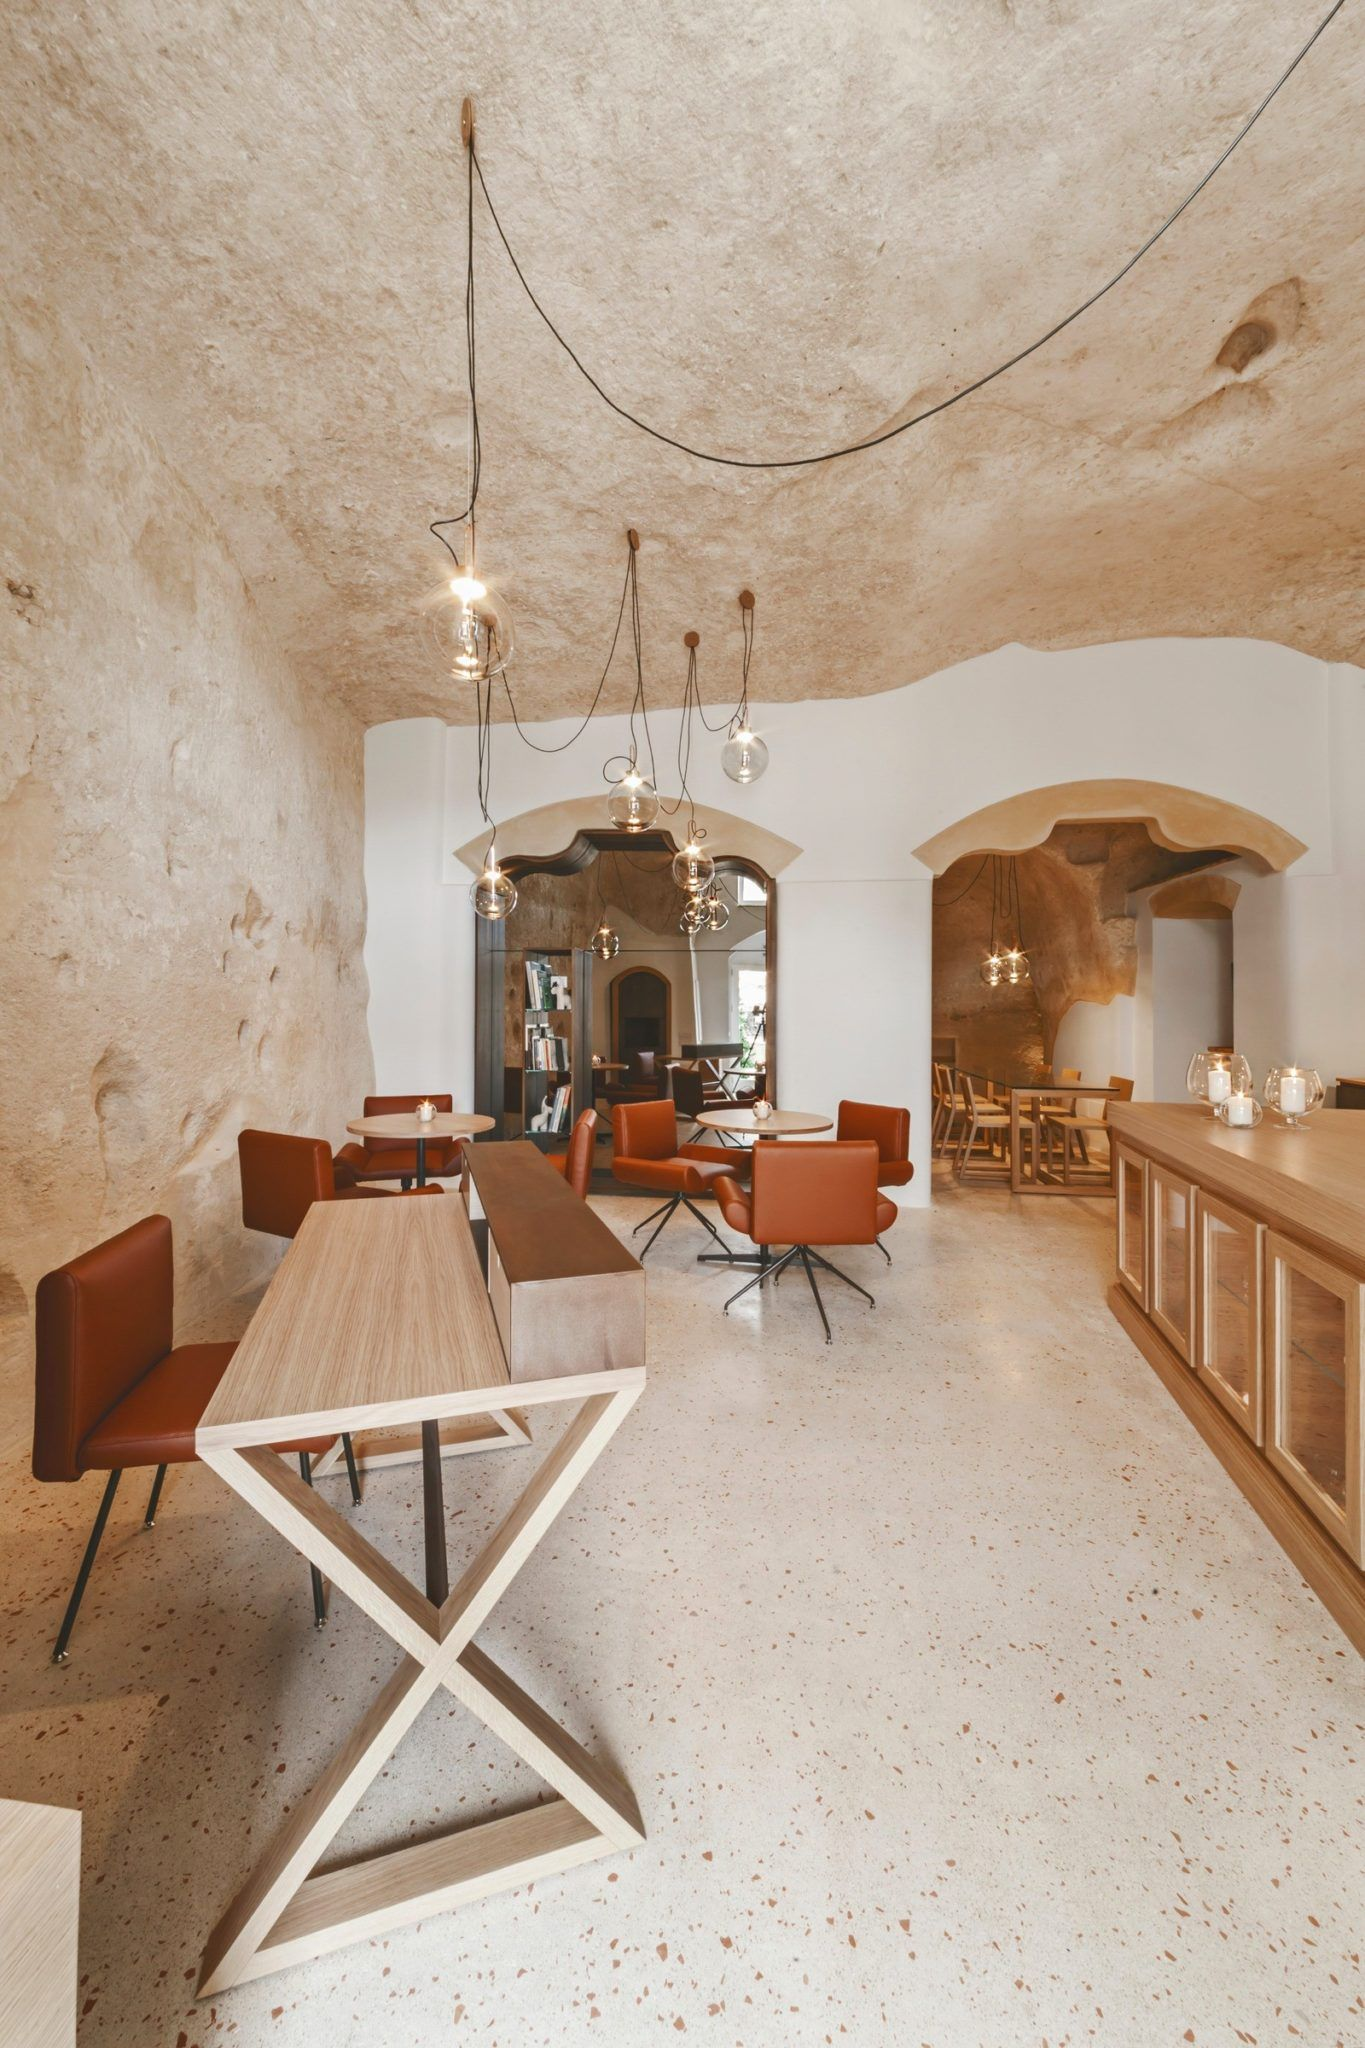 Superb INTERIOR DESIGN: The Man Cave Style   Huskdesignblog   La Dimora Di Metello    Rock House   Carved Rock   Interior Design Basement   Rock Interior  Design ...